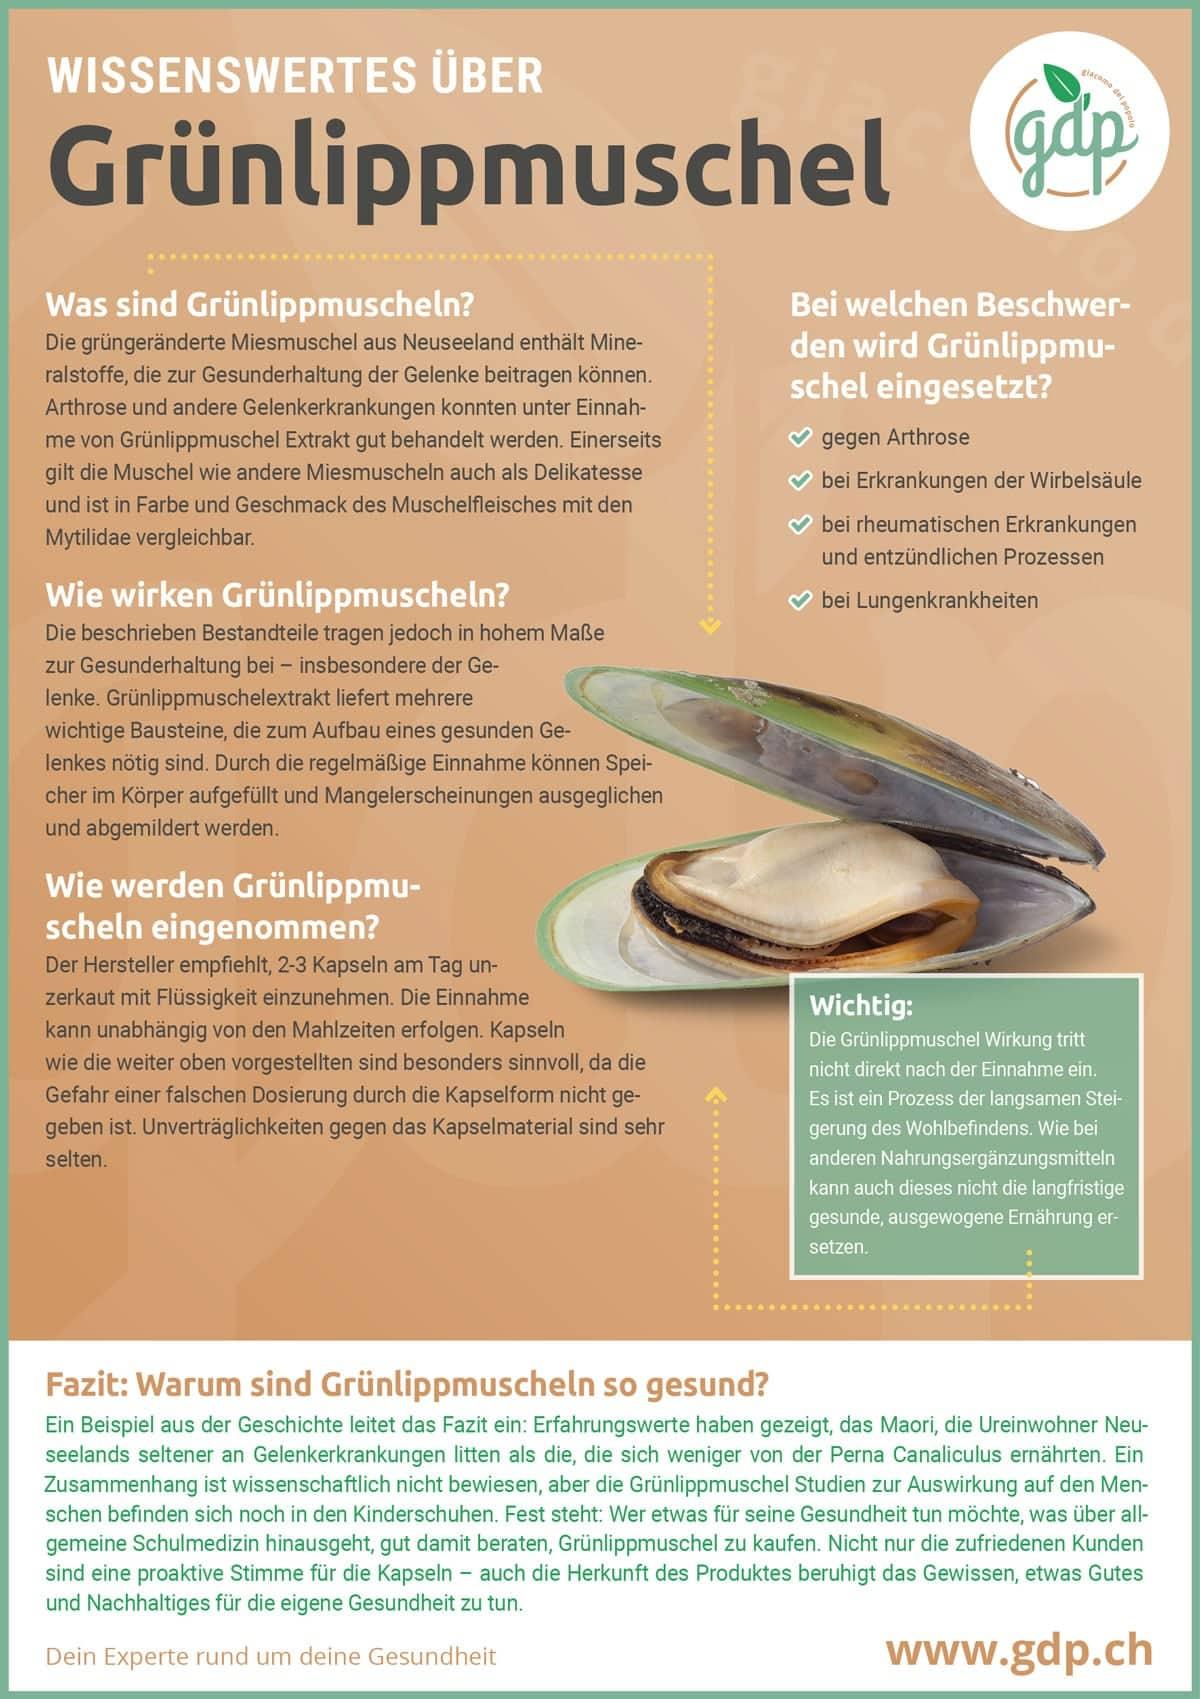 gruenlippmuschel gdp infografik